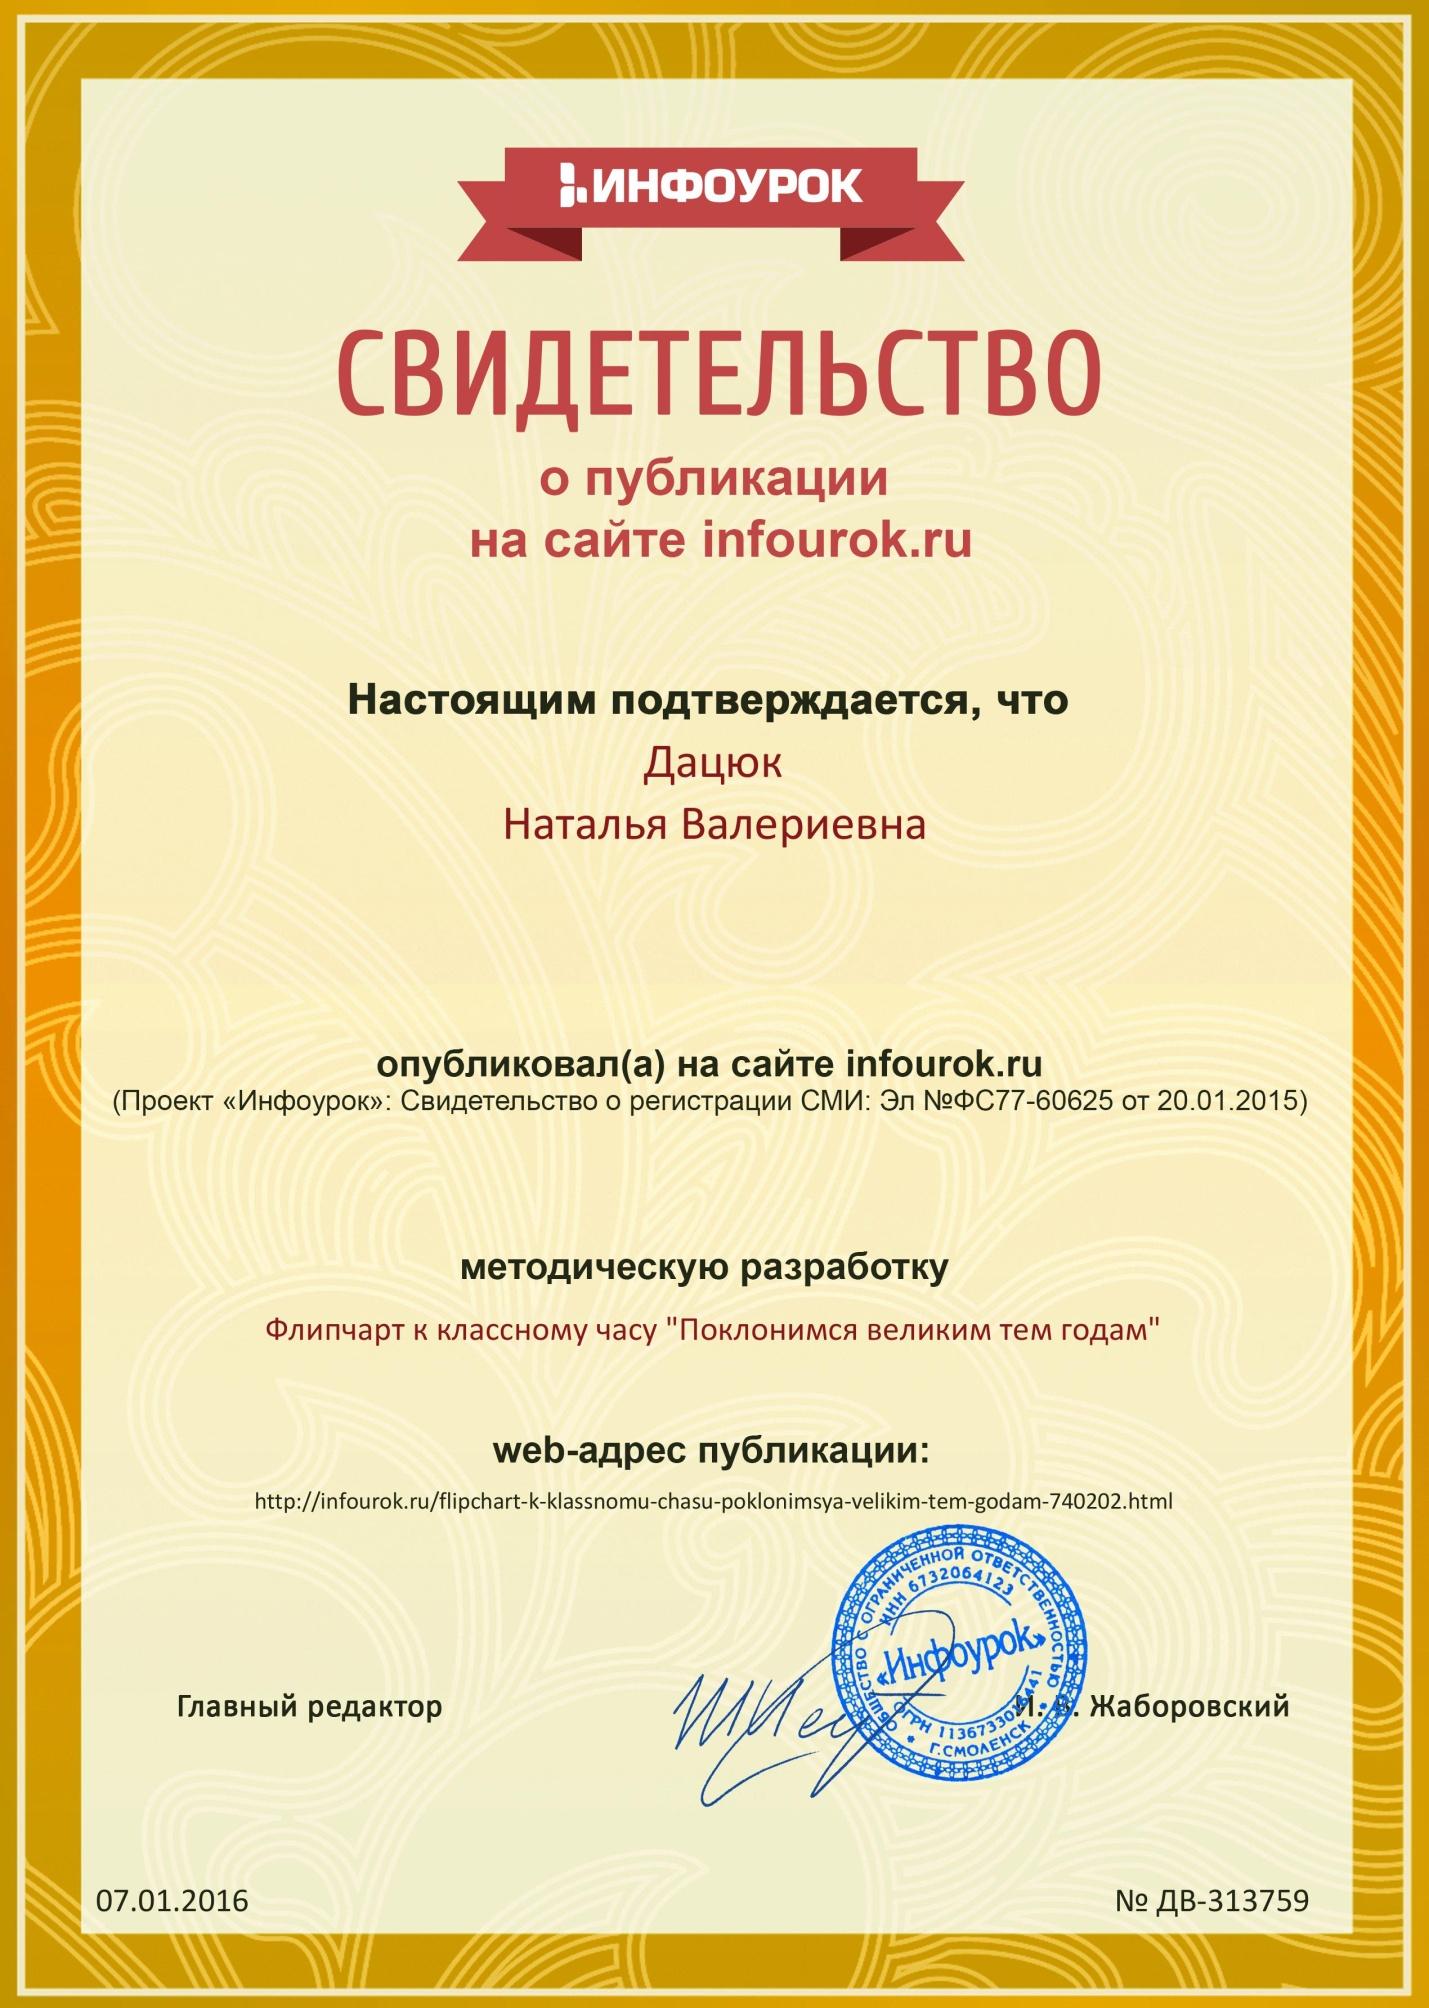 Сертификат проекта infourok.ru № ДВ-313759.jpg